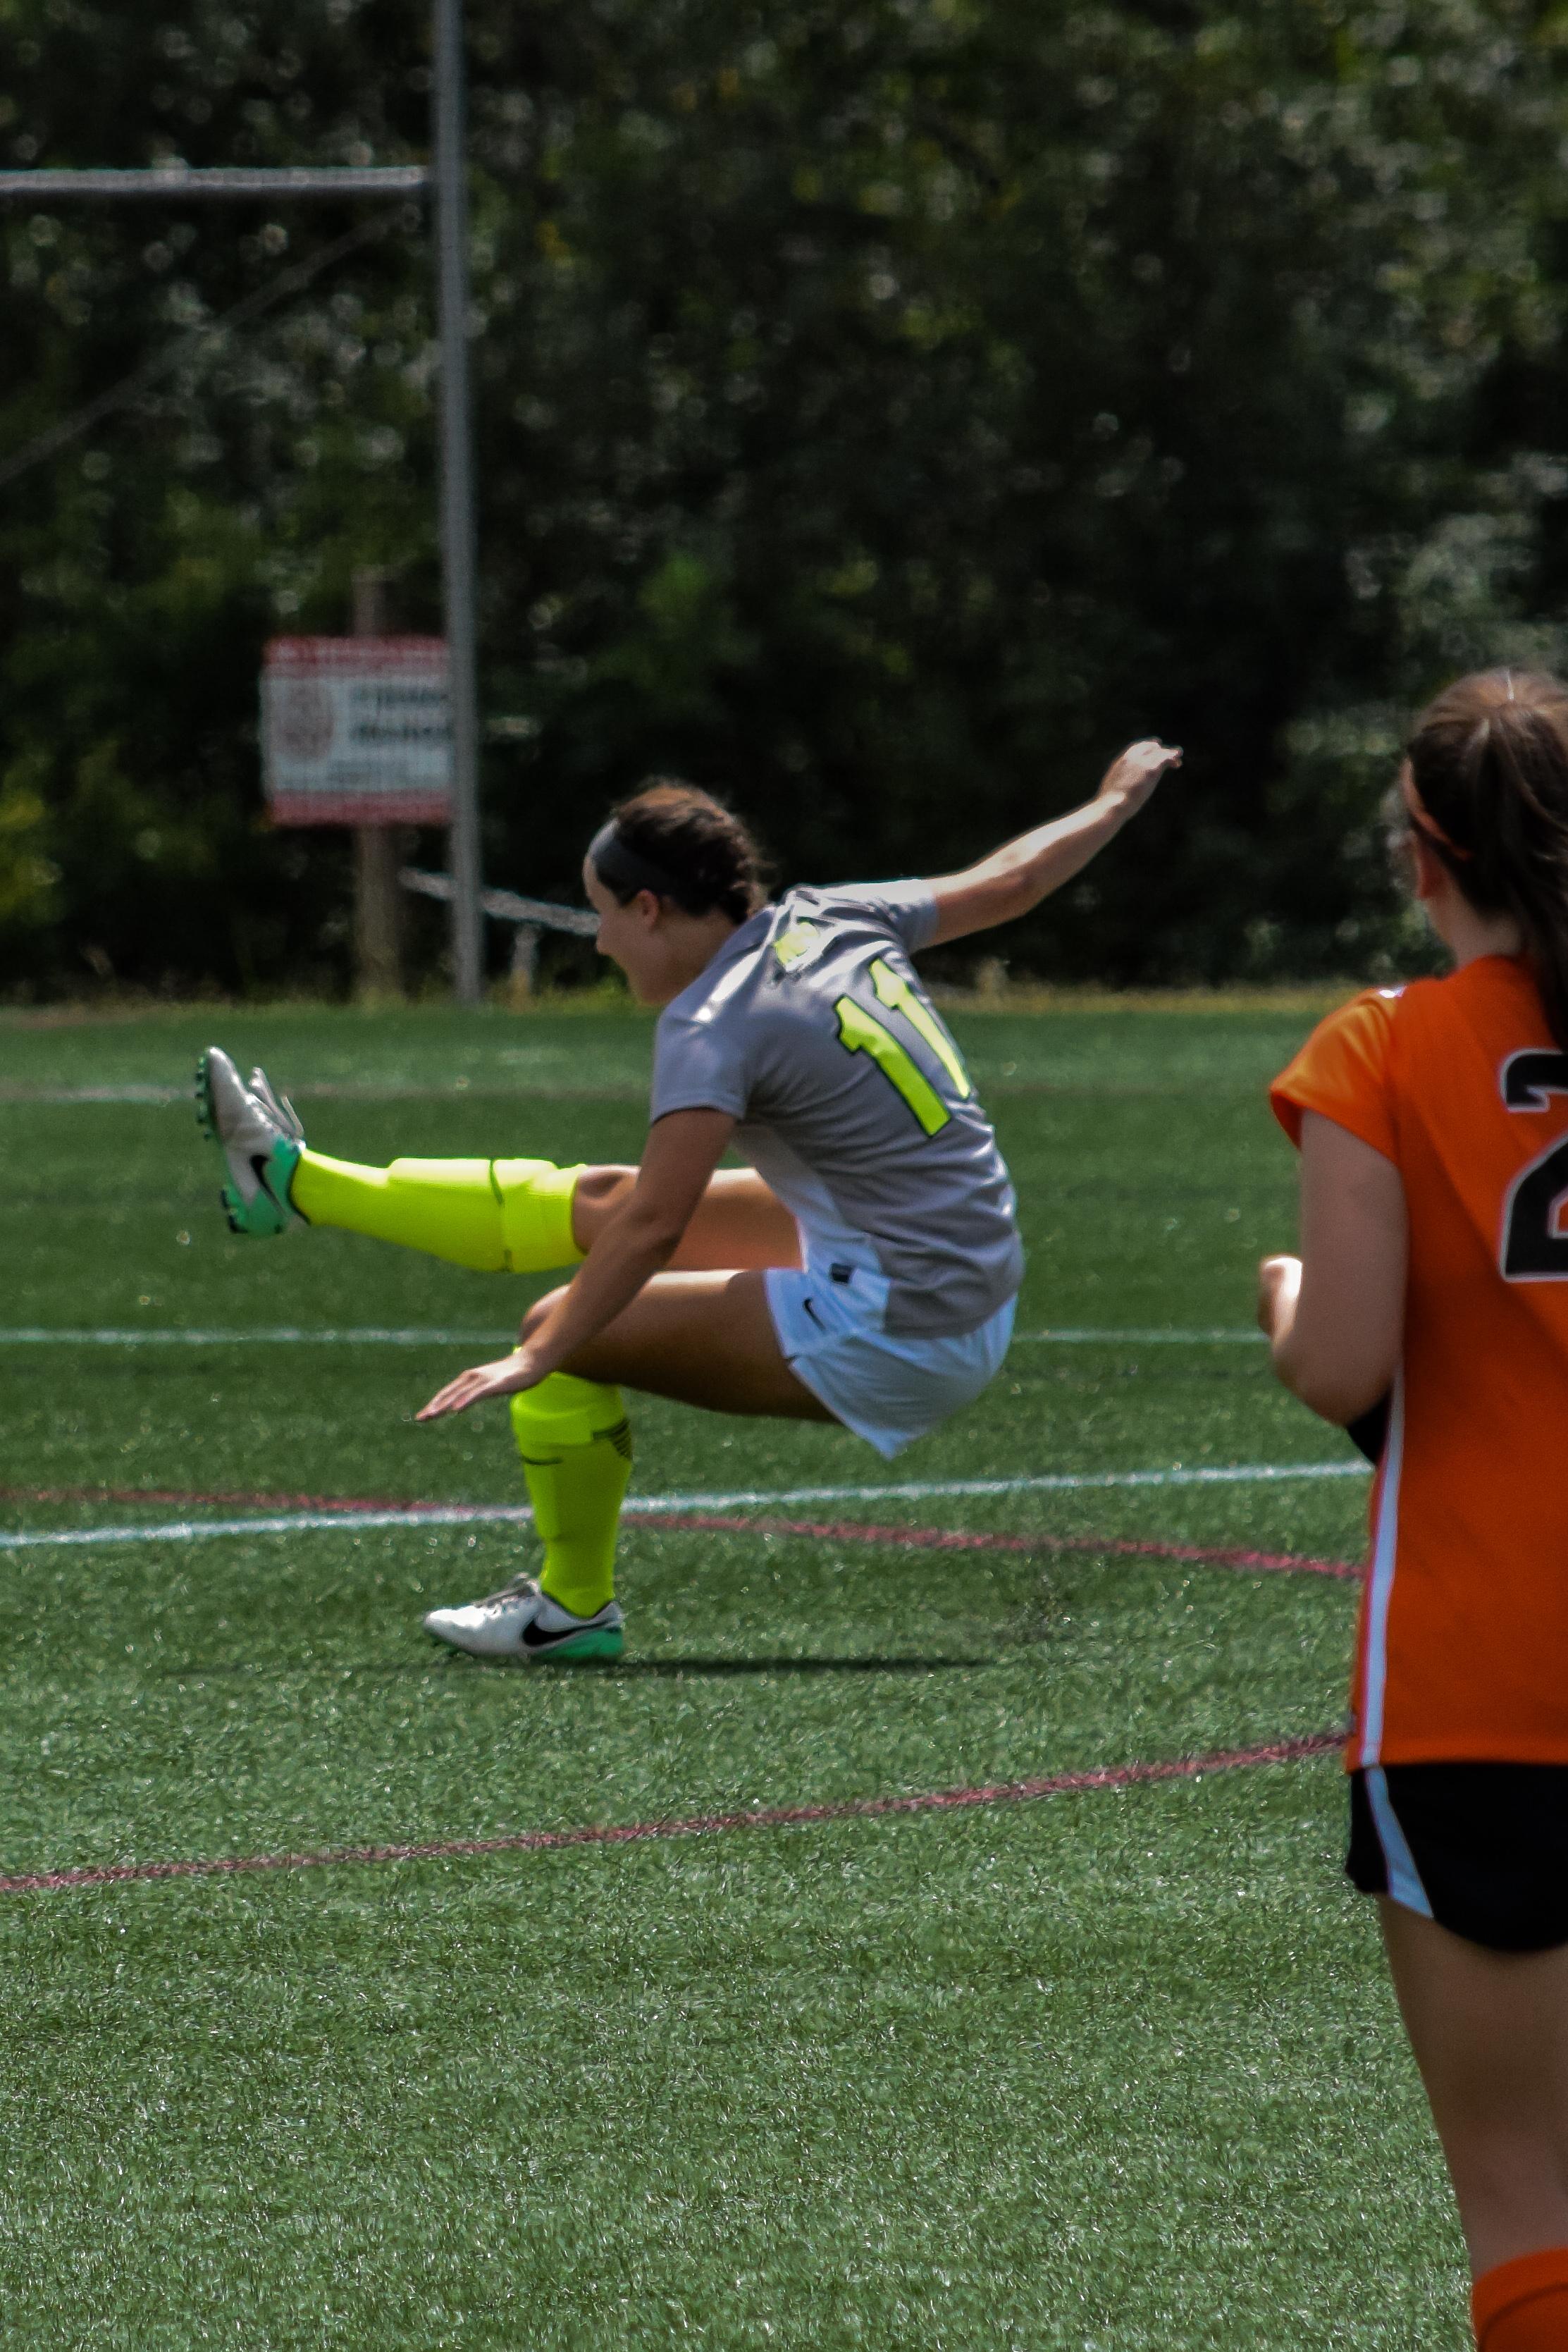 #11 Ayden Boatwright shows off her balancing skills after she kicks the ball.